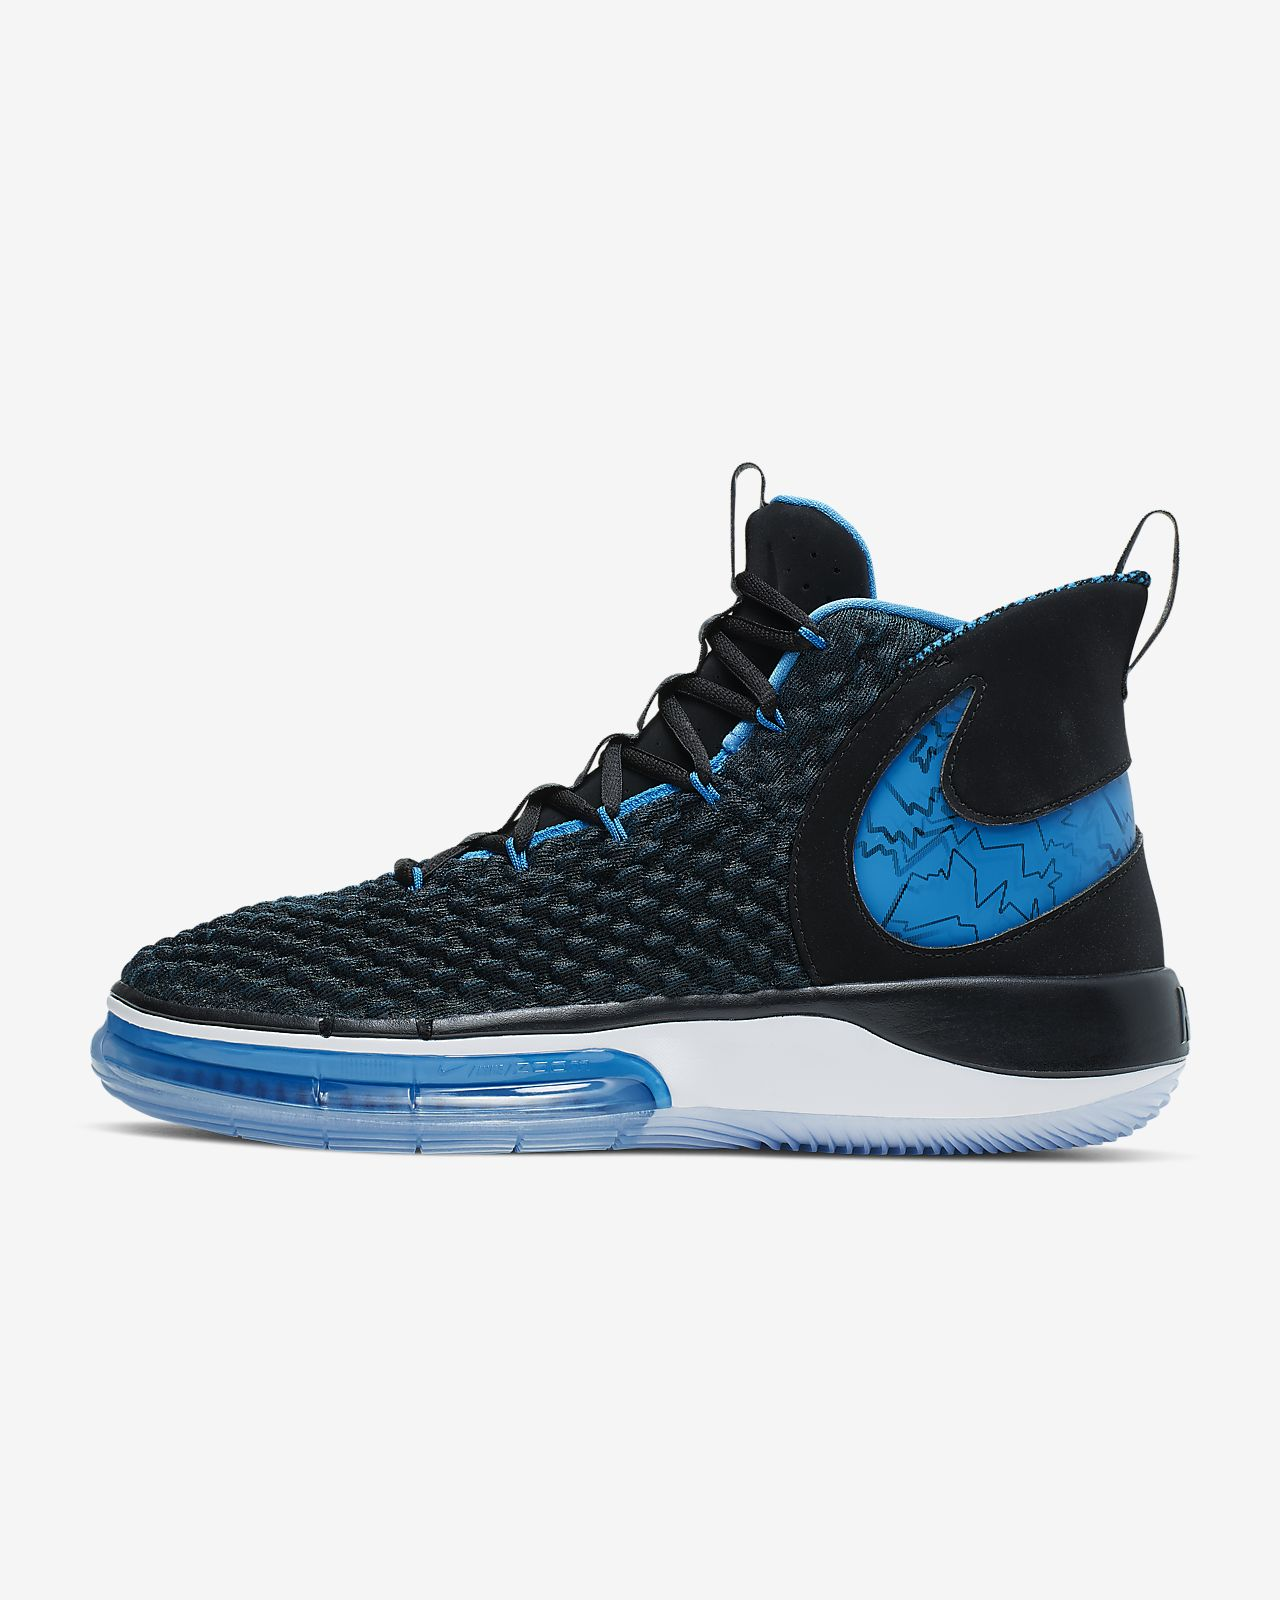 Nike AlphaDunk Basketballschuh